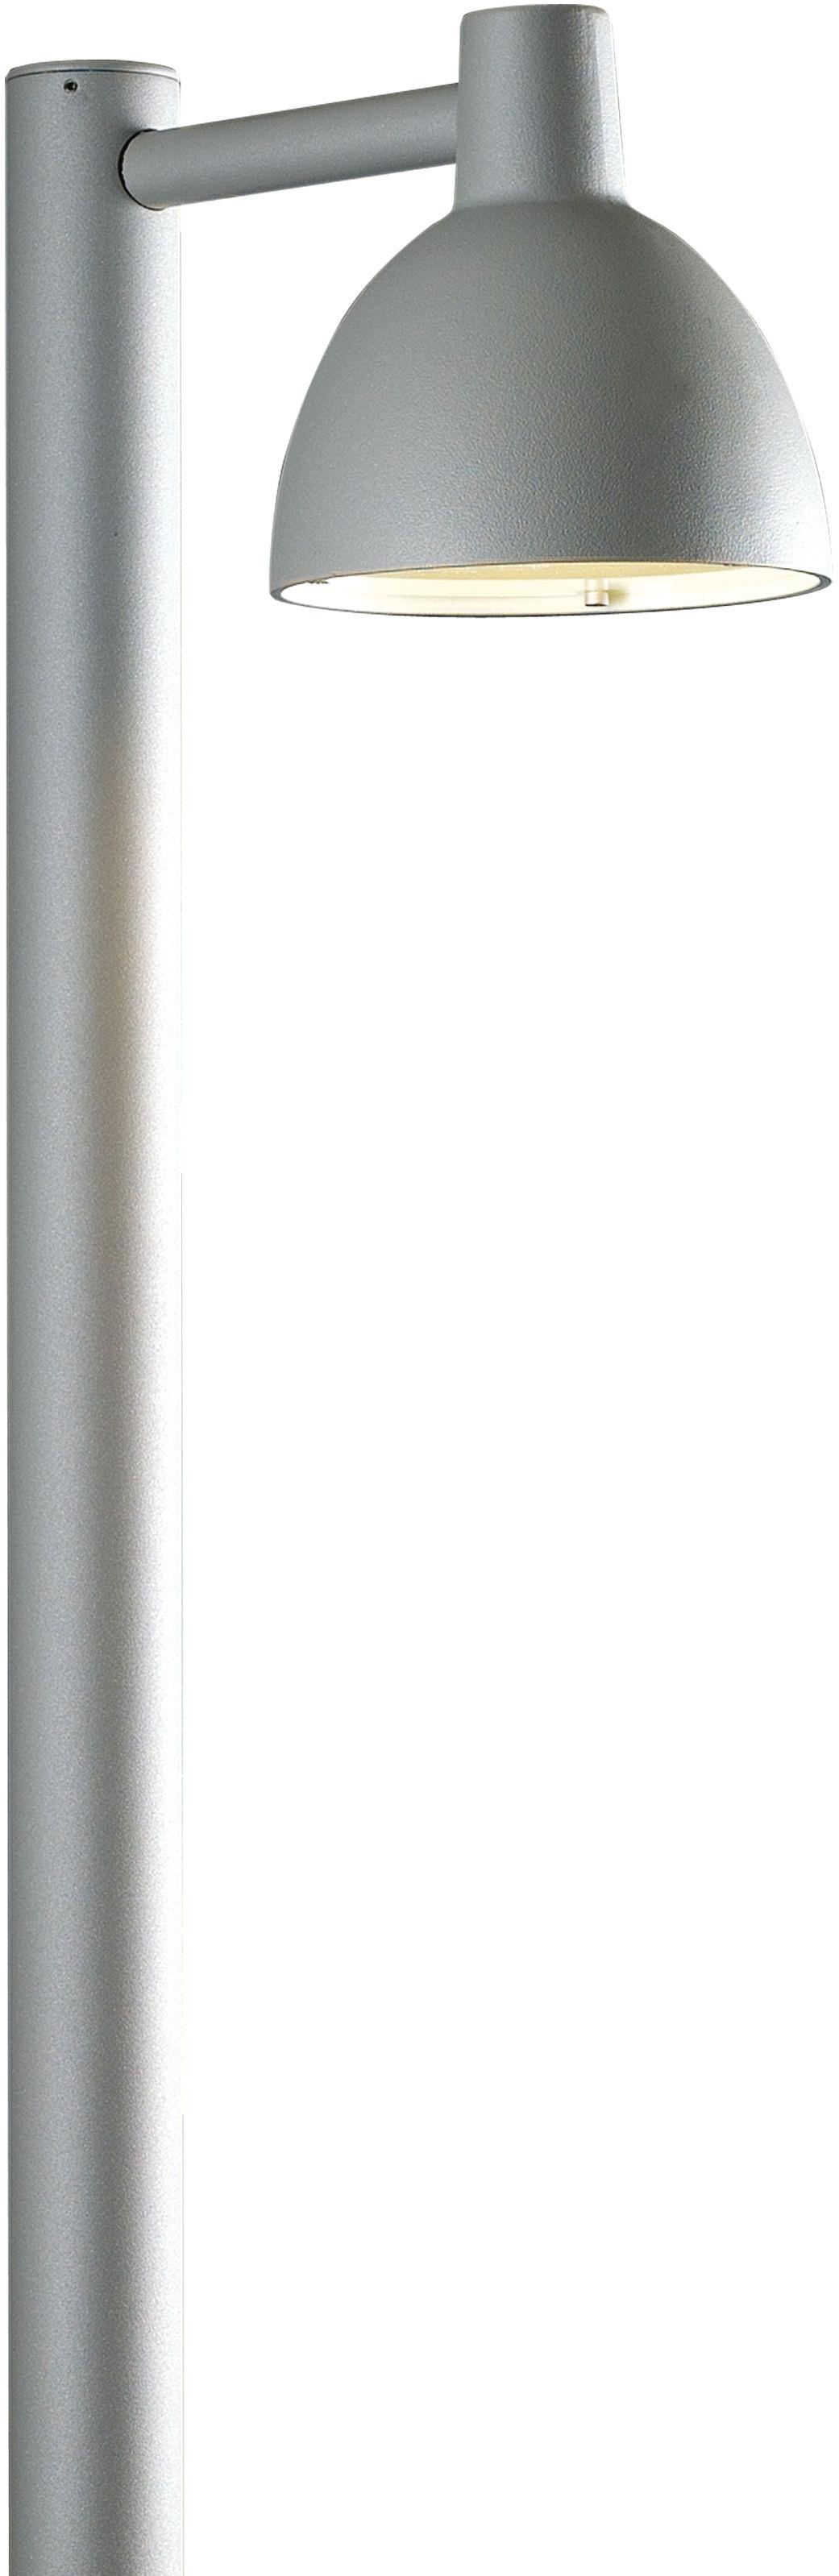 Lighting - Outdoor Lighting - Toldbod Garden light - H 90 cm by Louis Poulsen - Aluminium - Aluminium